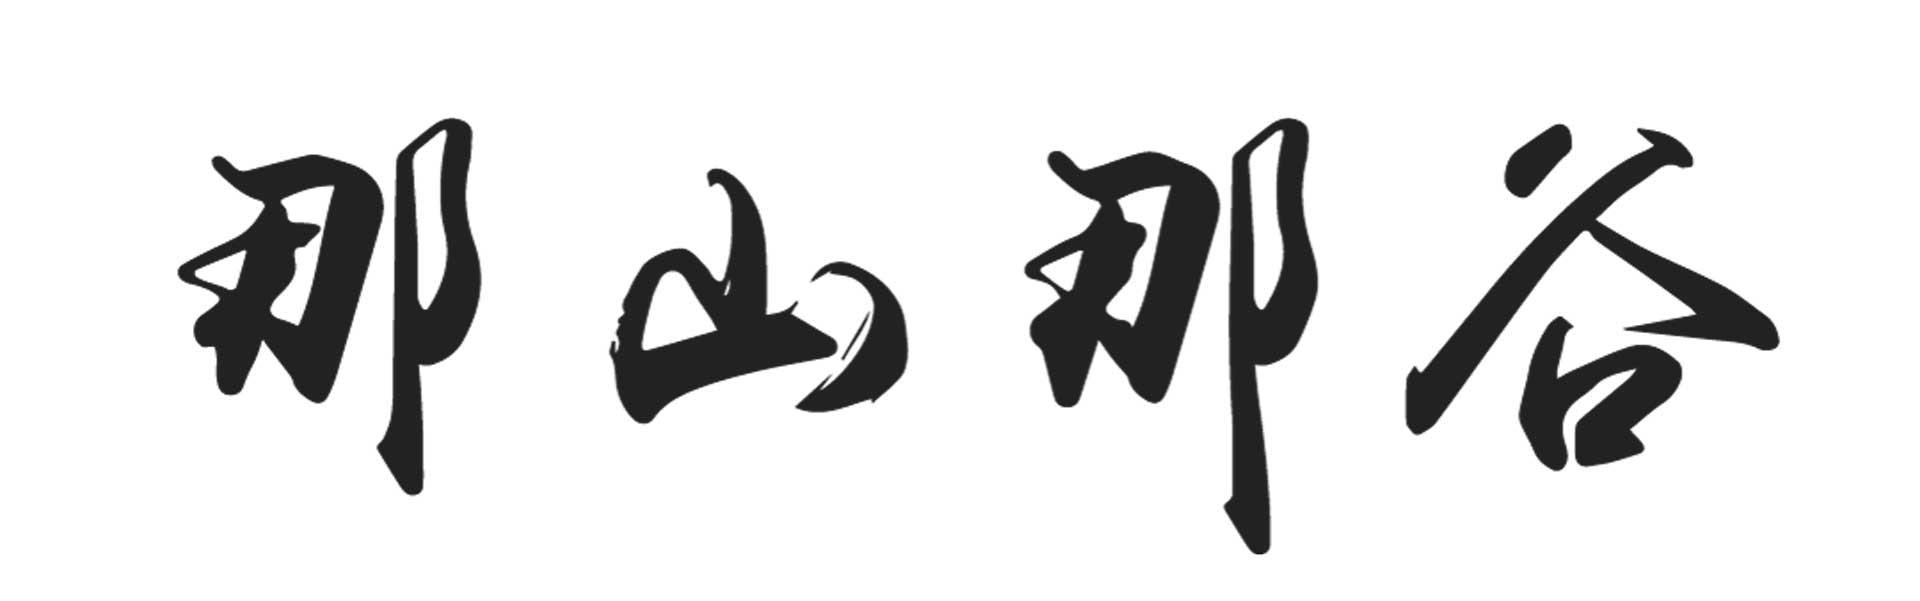 那山那谷品牌 Logo